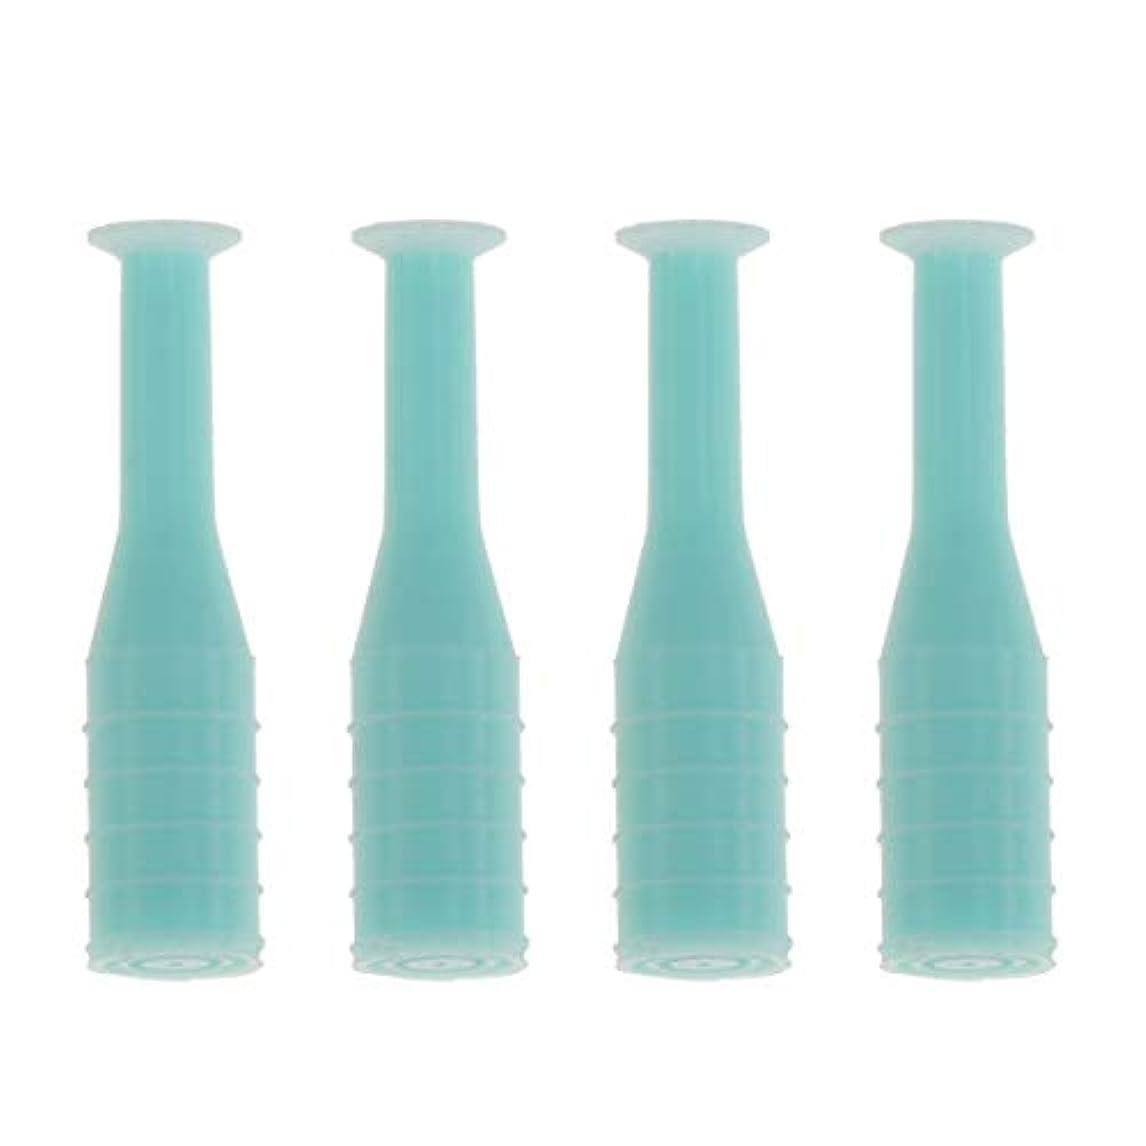 HEALLILY 8本入りソフト/ハードコンタクトレンズインサーターリムーバブルコンタクトレンズサクションカップスティック工具用ボトル旅行用(緑)